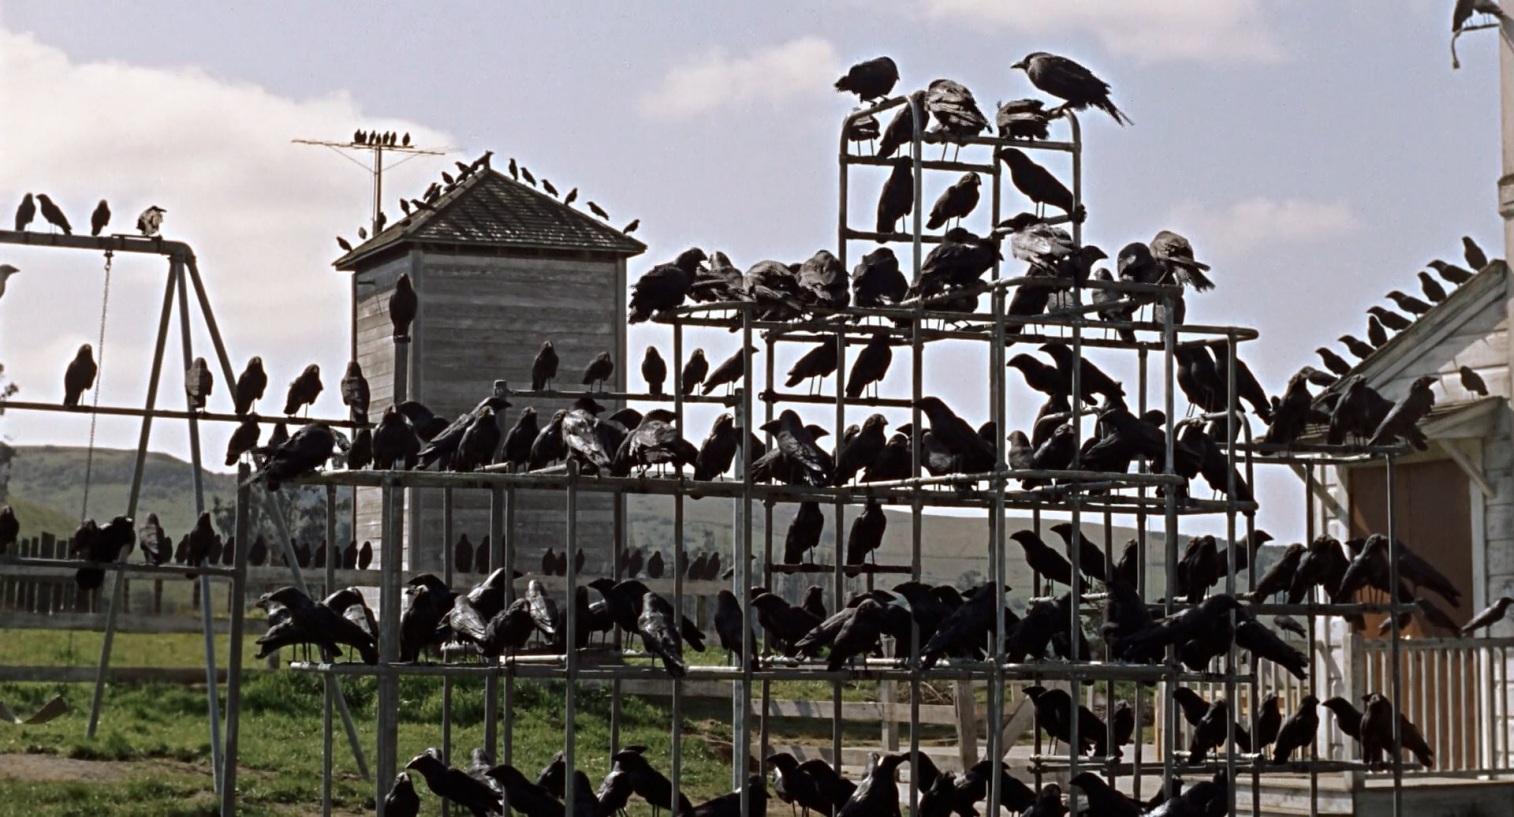 هيتشكوك - الطيور